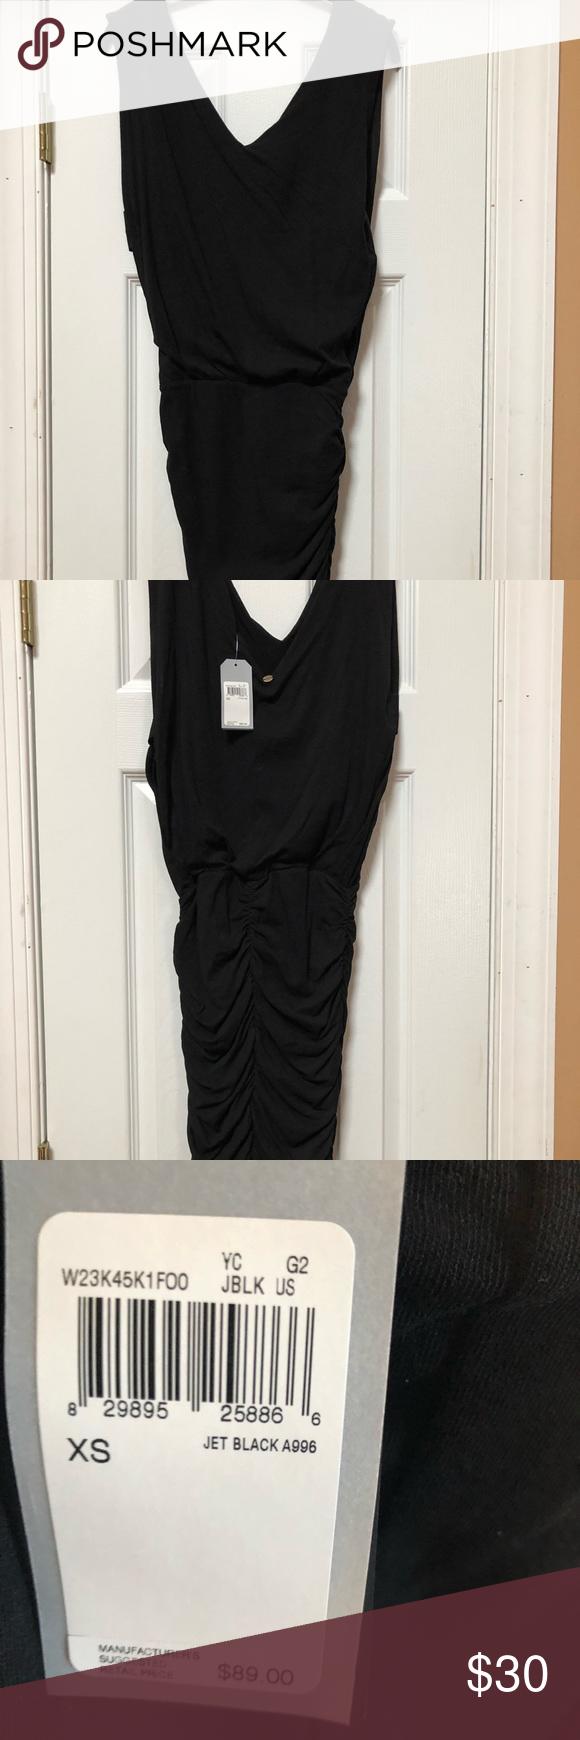 Nwt guess black vneck dress nwt guess dress cotton and models